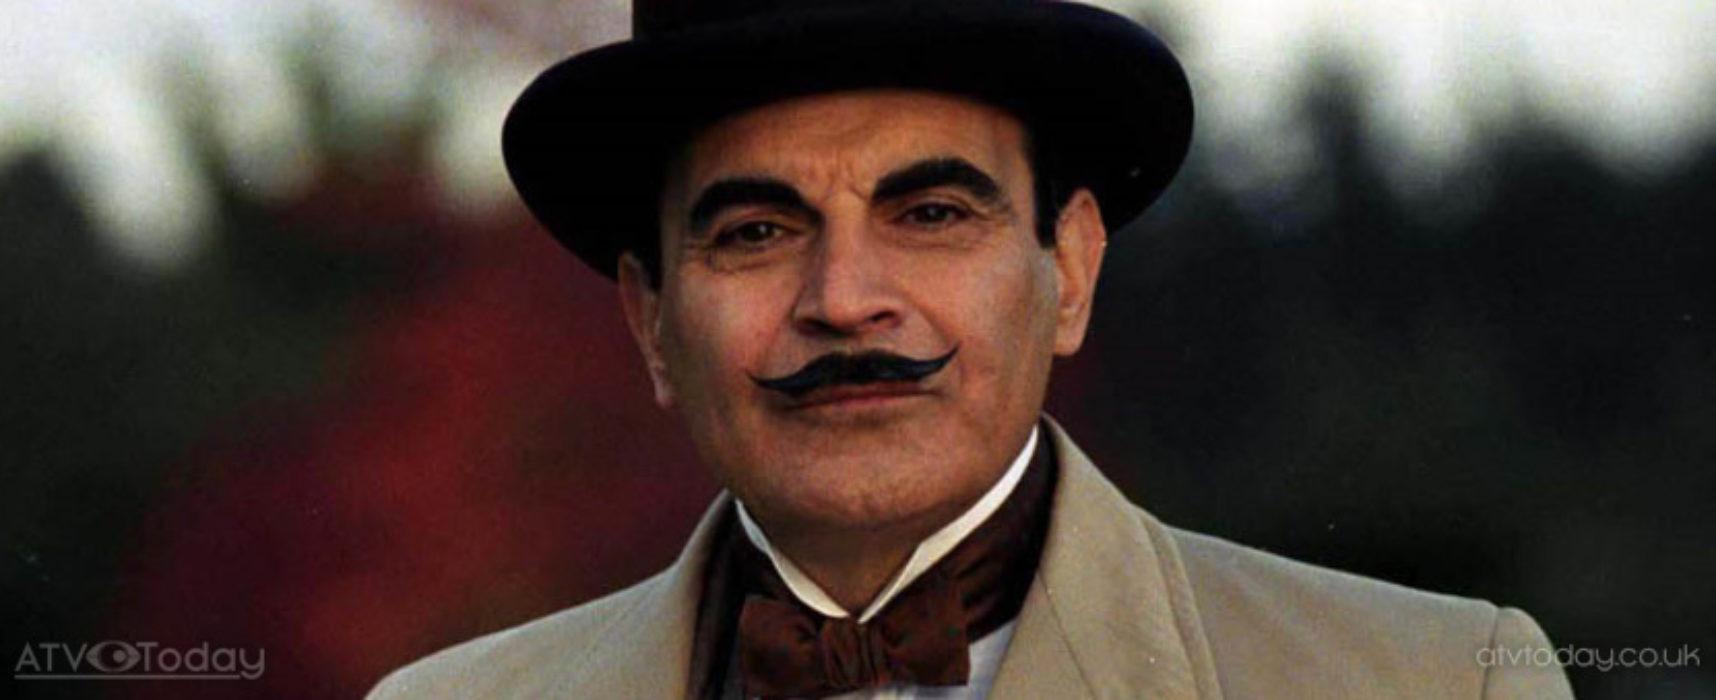 David Suchet on his Poirot farewell